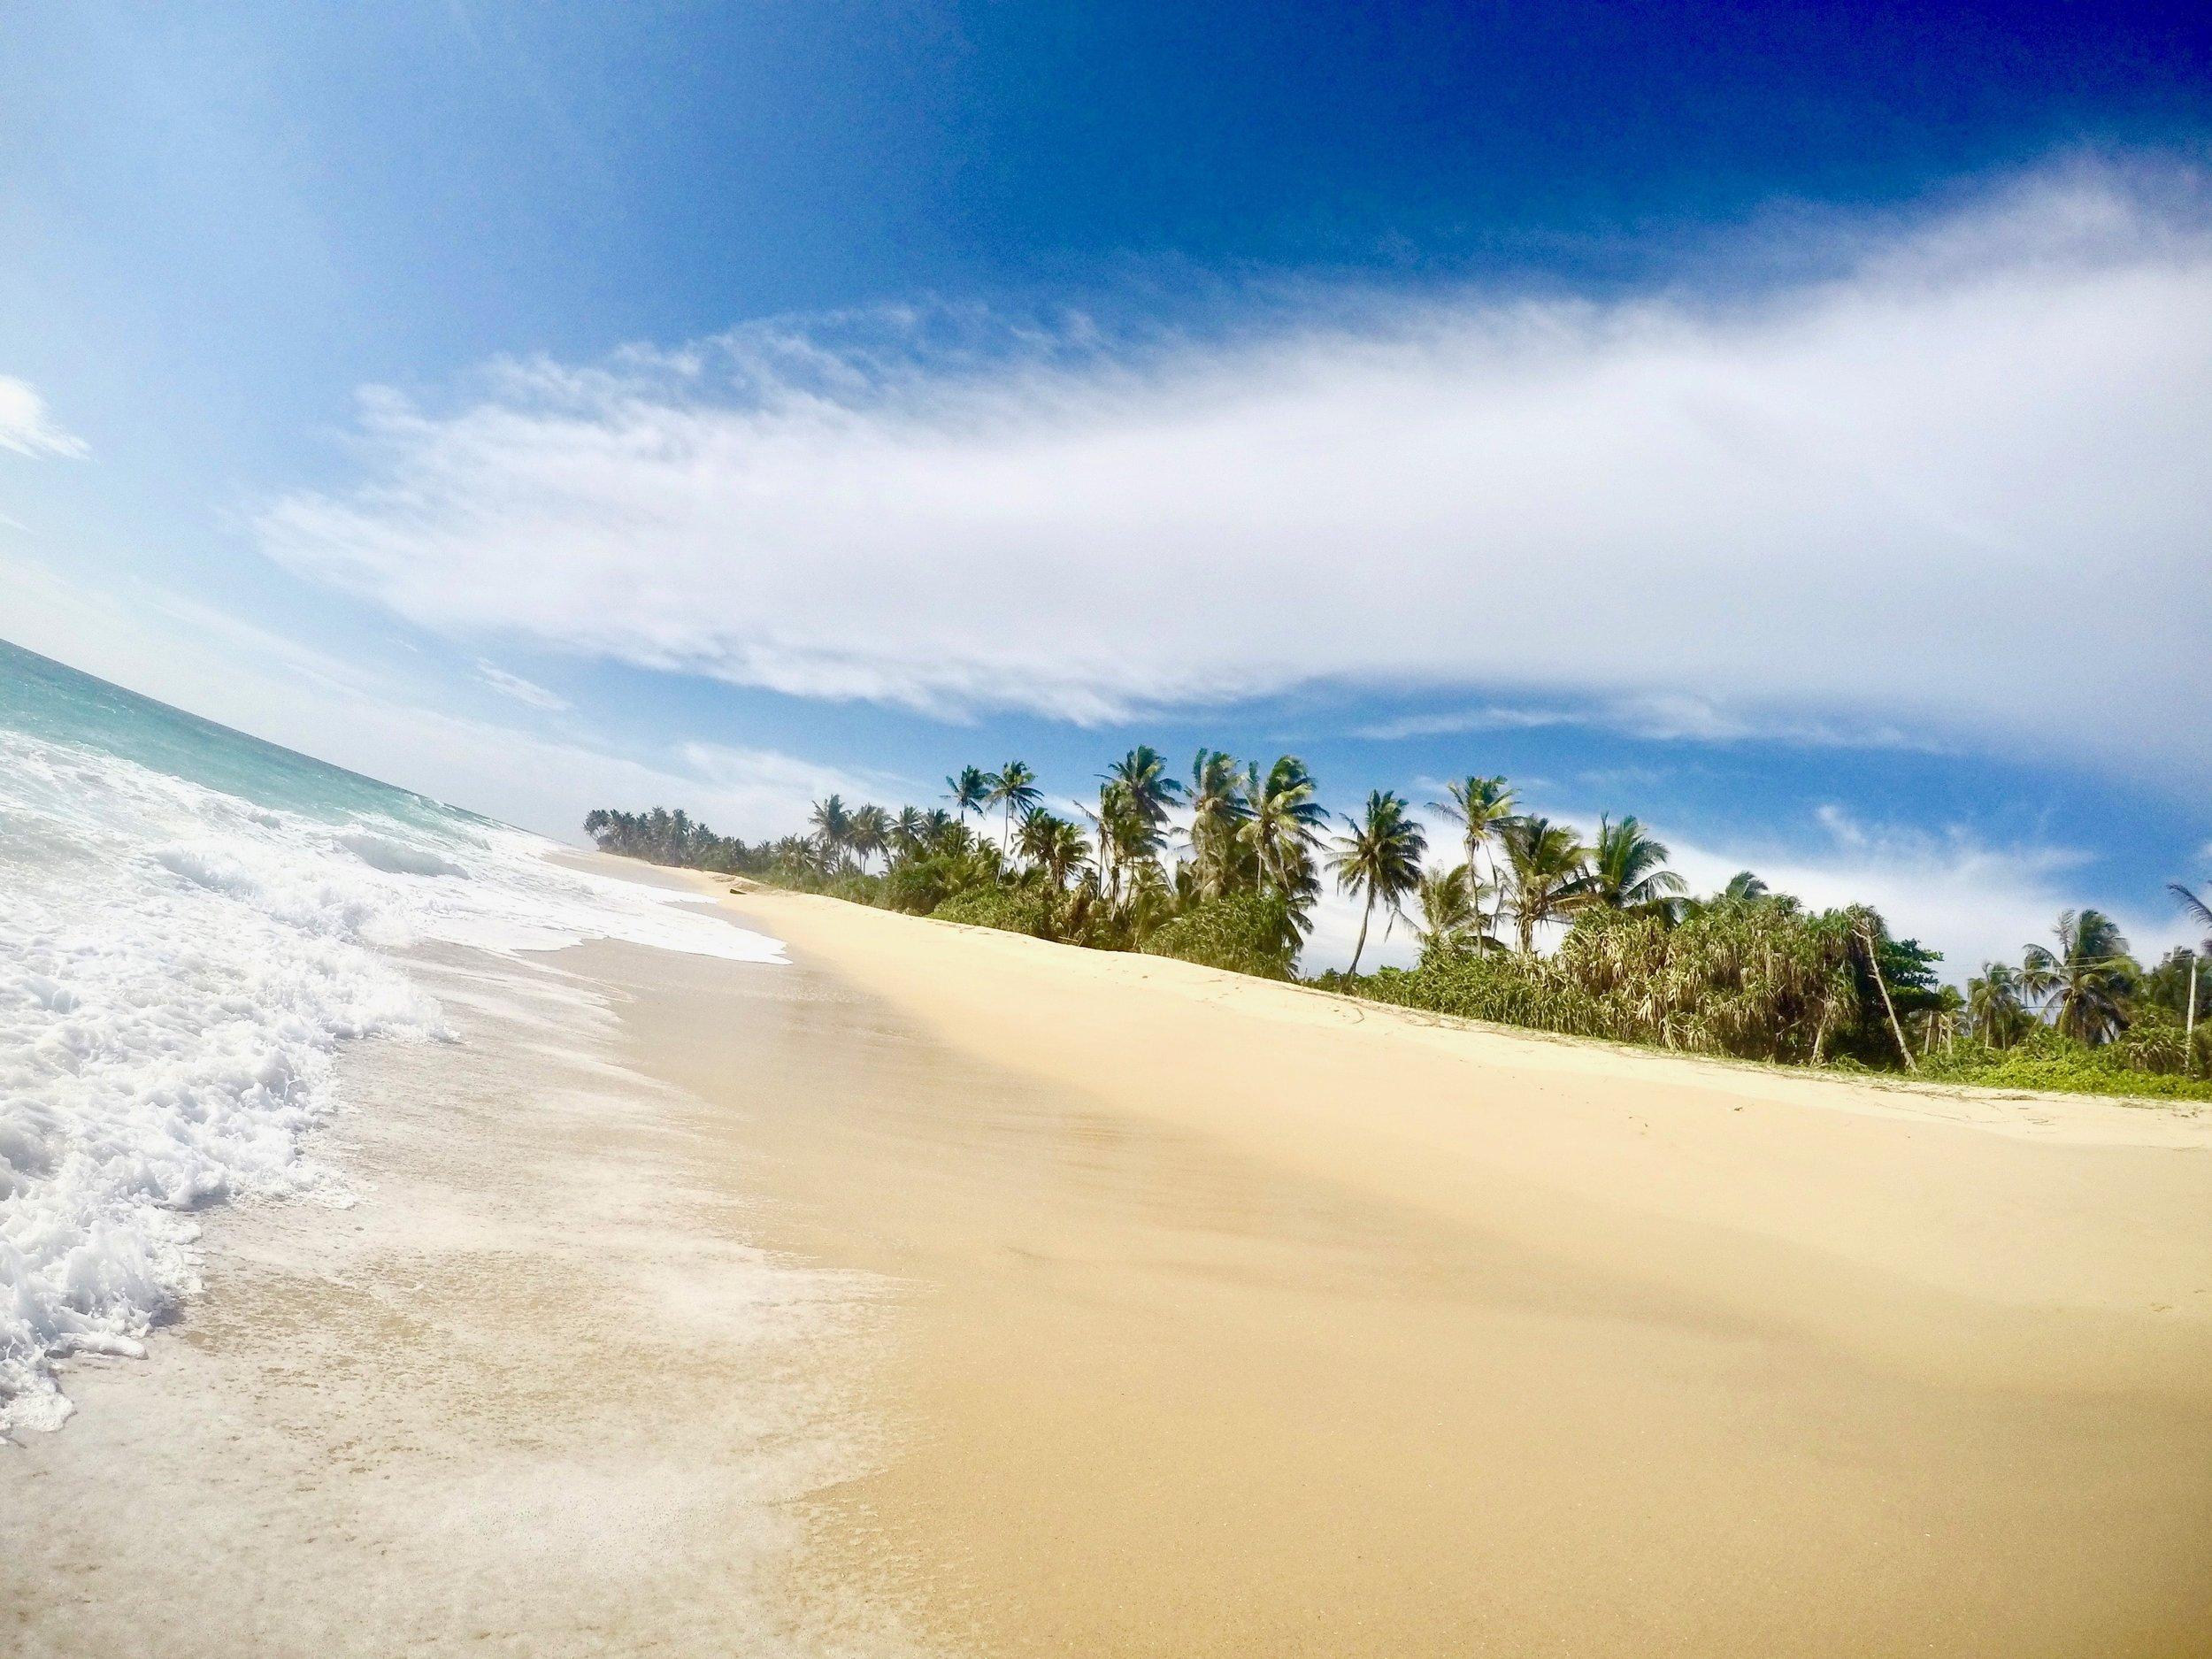 Hikkaduwa definitely made it on our list of the best beaches in Sri Lanka.